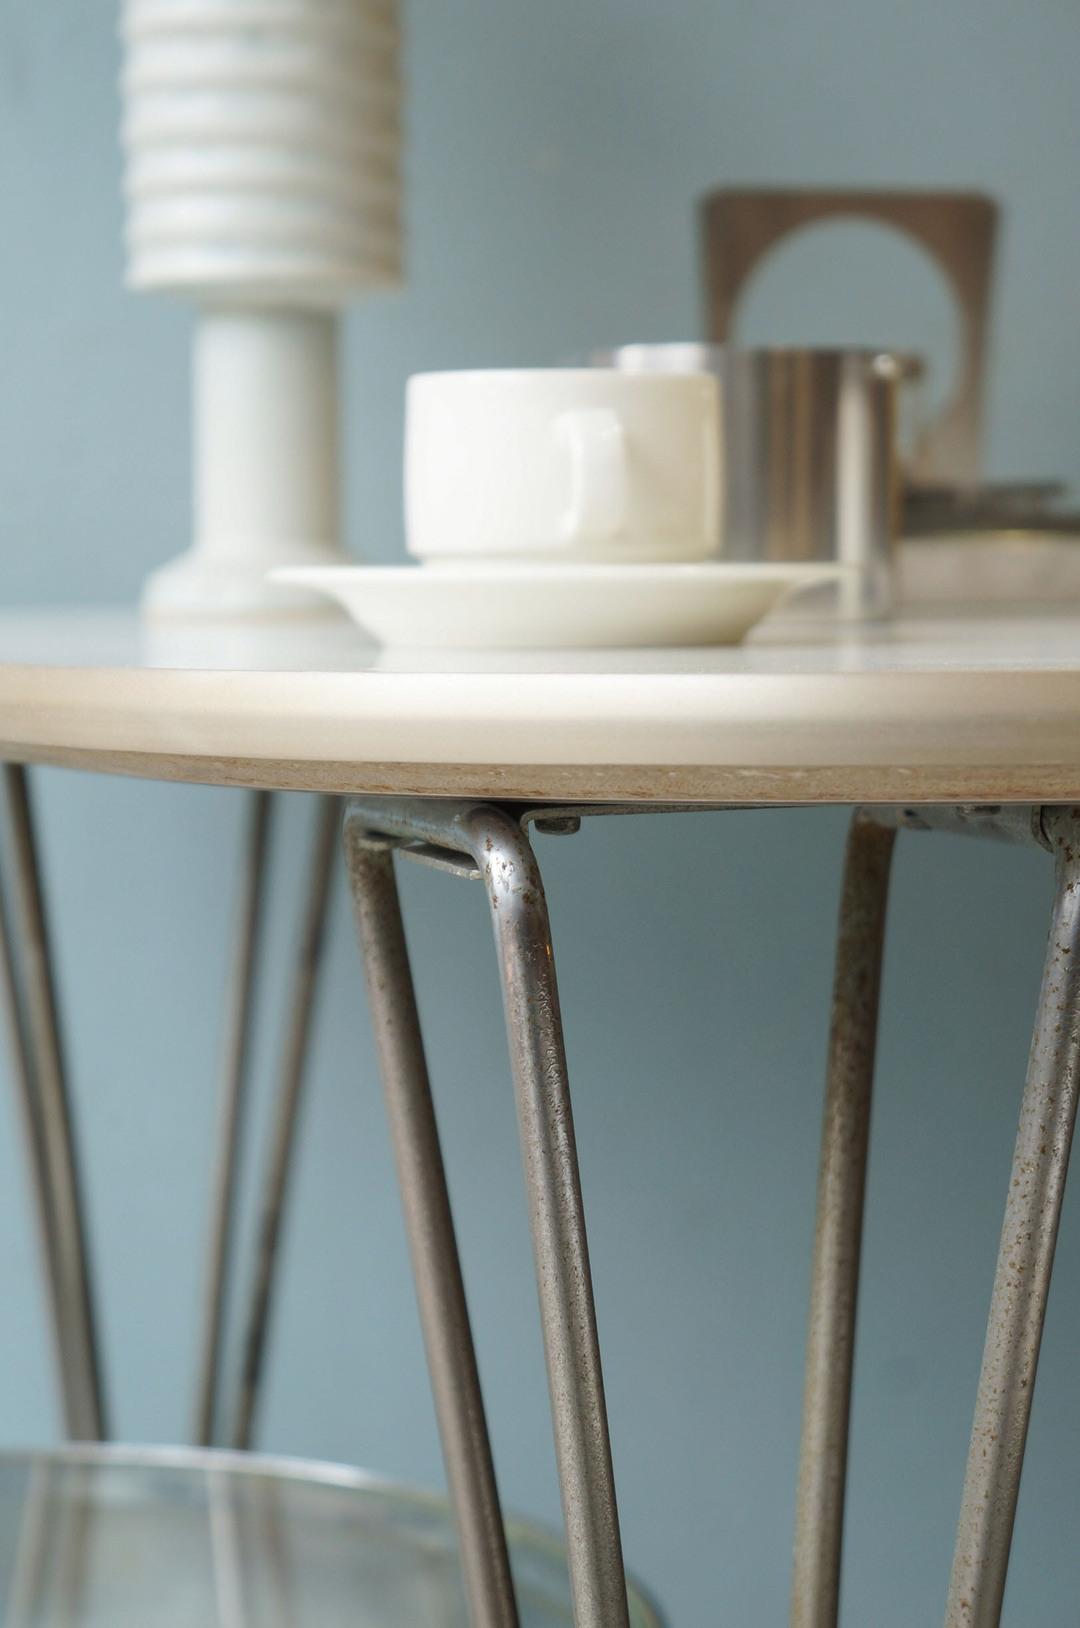 Fritz Hansen Dining Table by Piet Hein 1970's/フリッツハンセン スーパー円テーブル Bテーブル ピート・ハイン 北欧ヴィンテージ 3